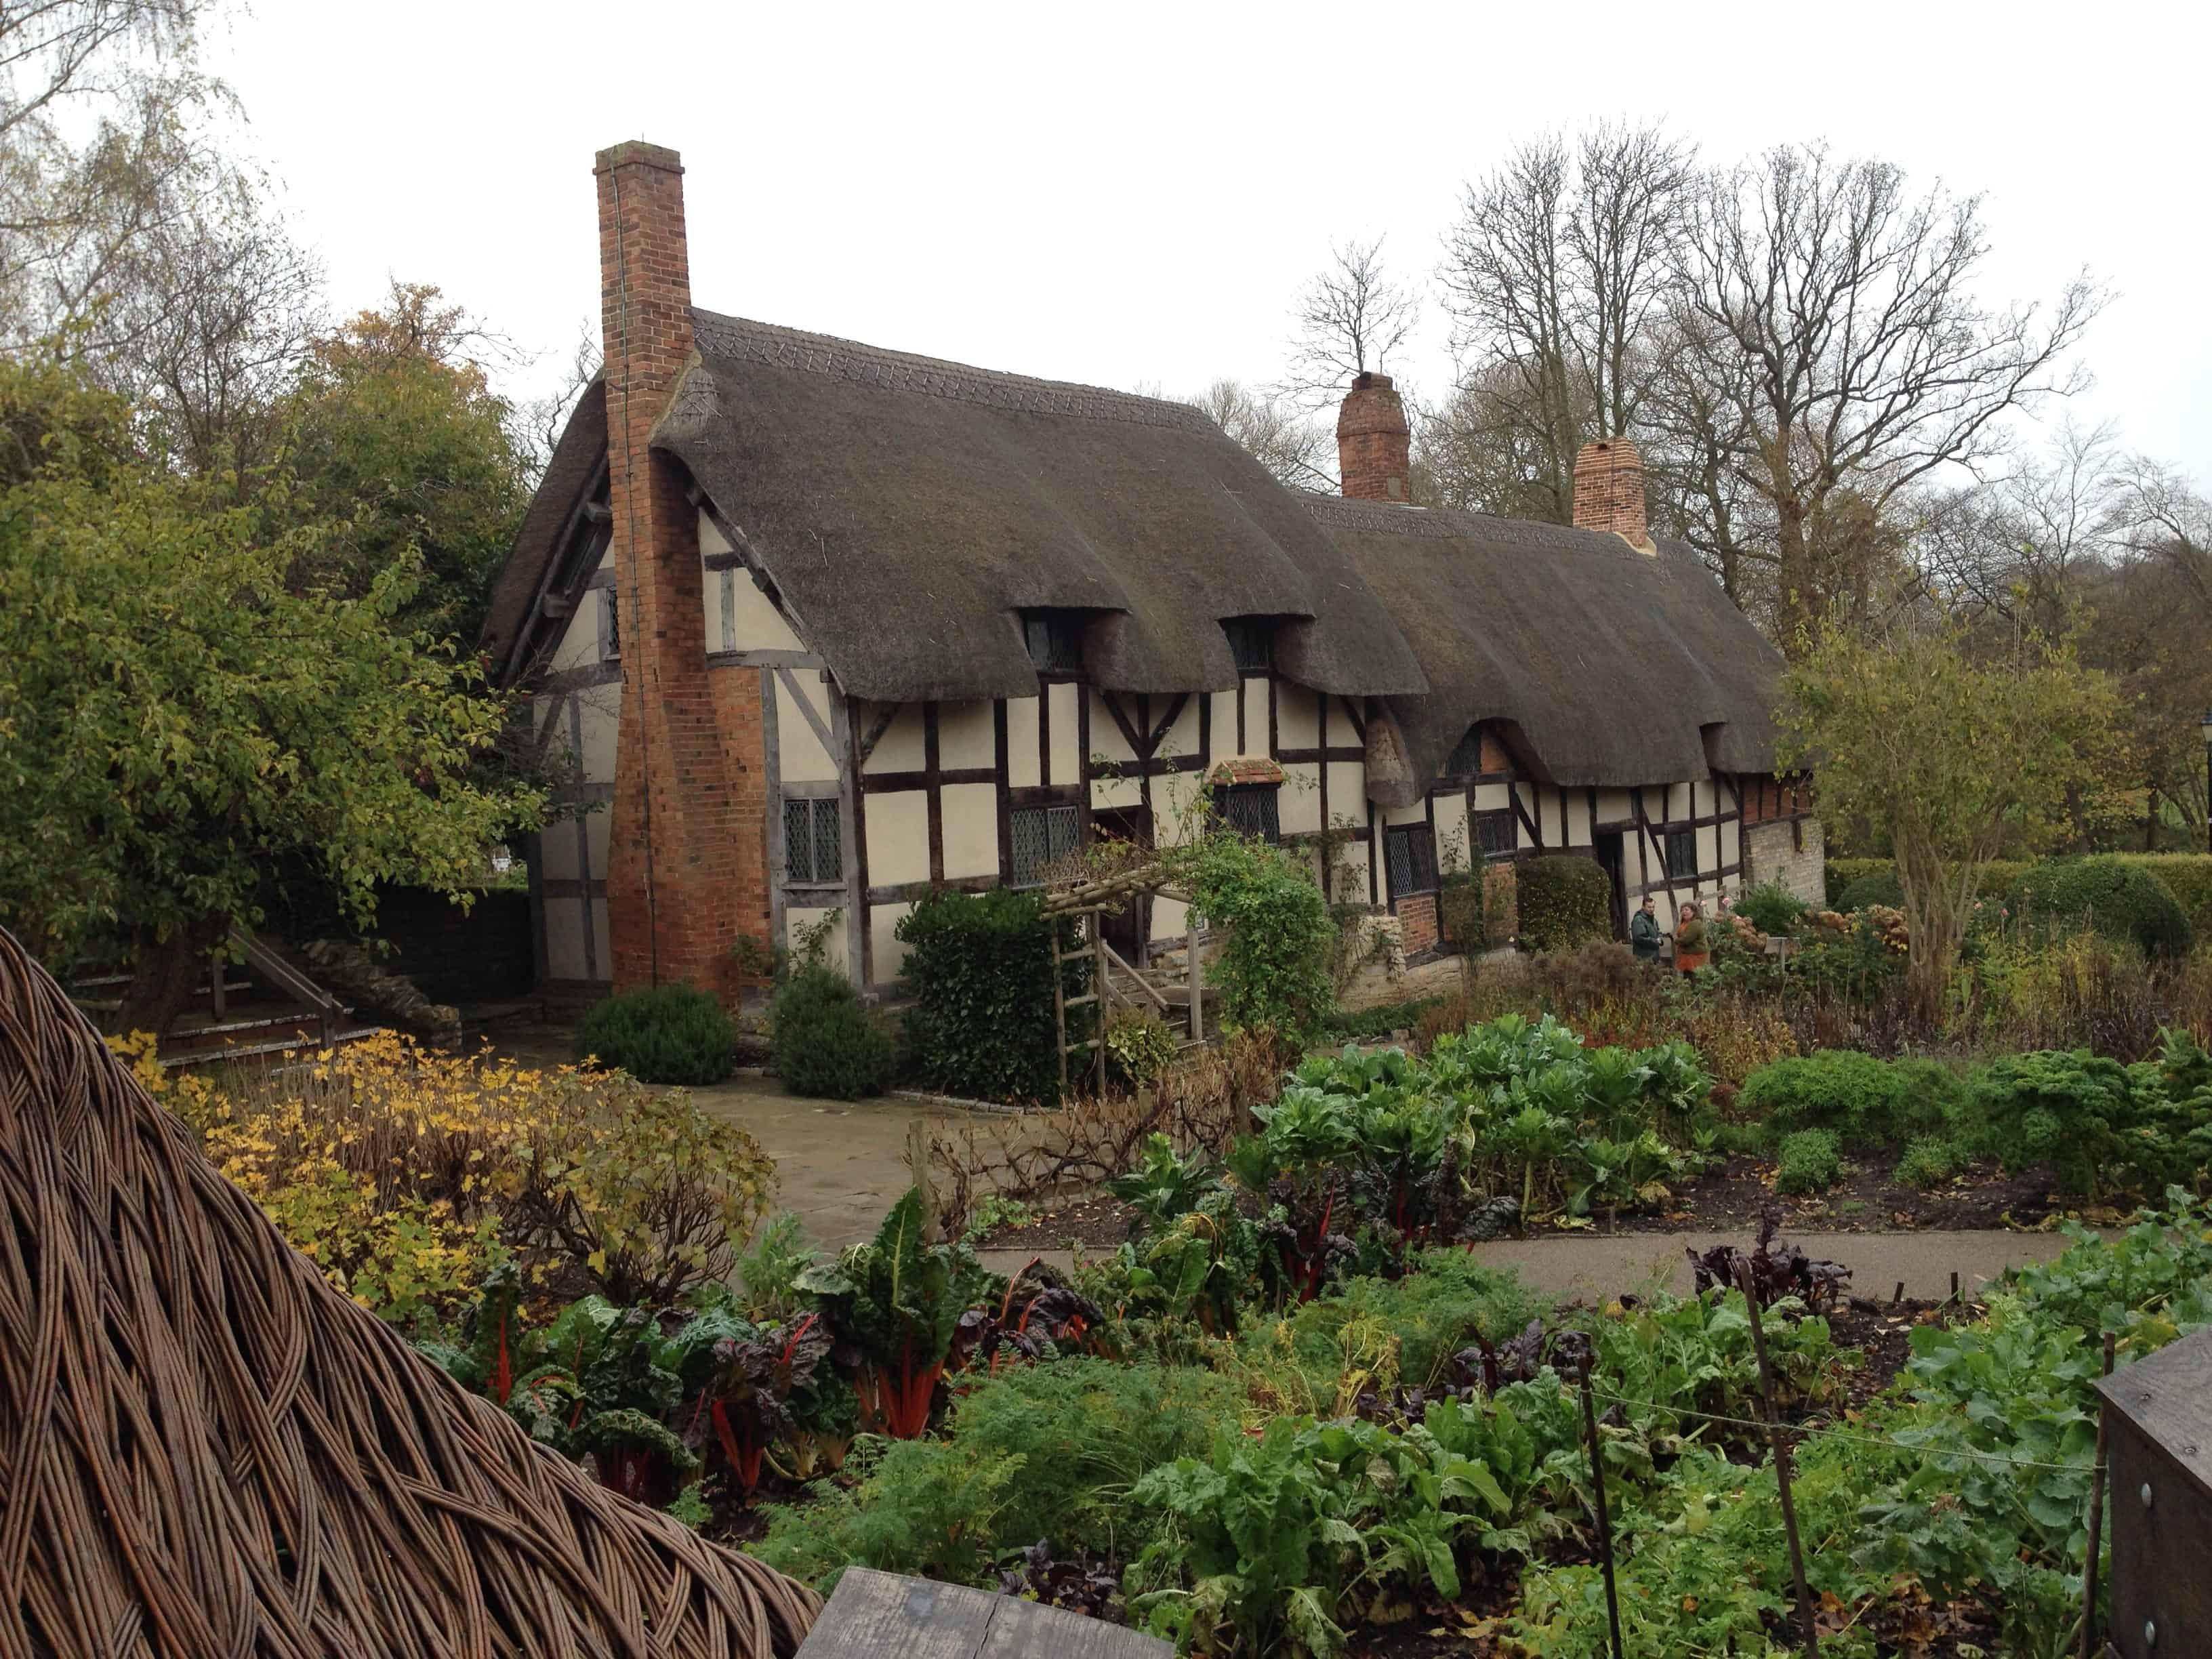 House in Stratford upon Avon